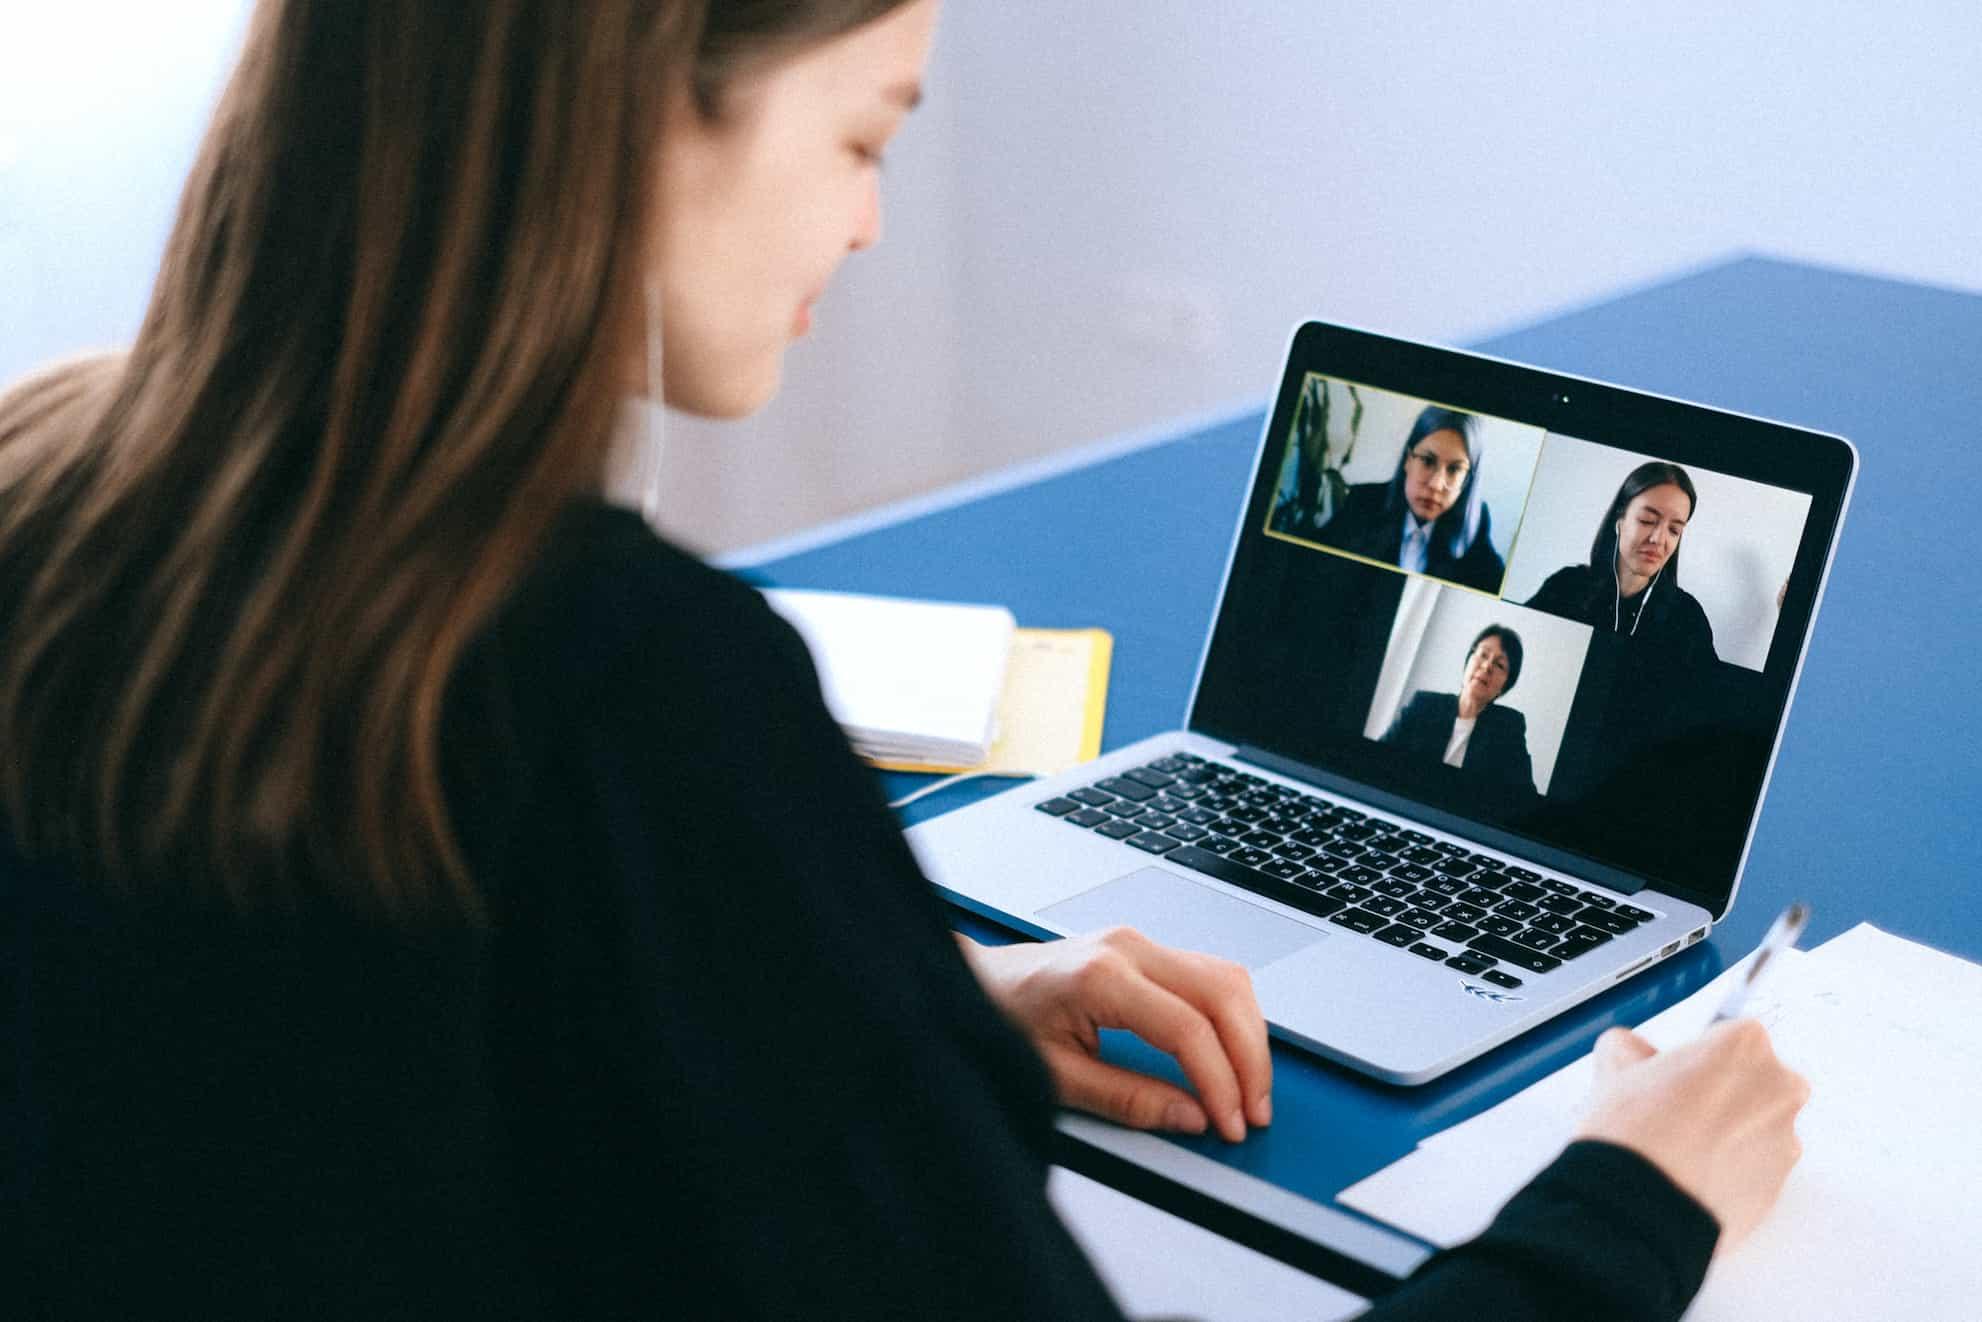 capital h | reclutamiento de personal | Estrategias para el reclutamiento de personal en 2021